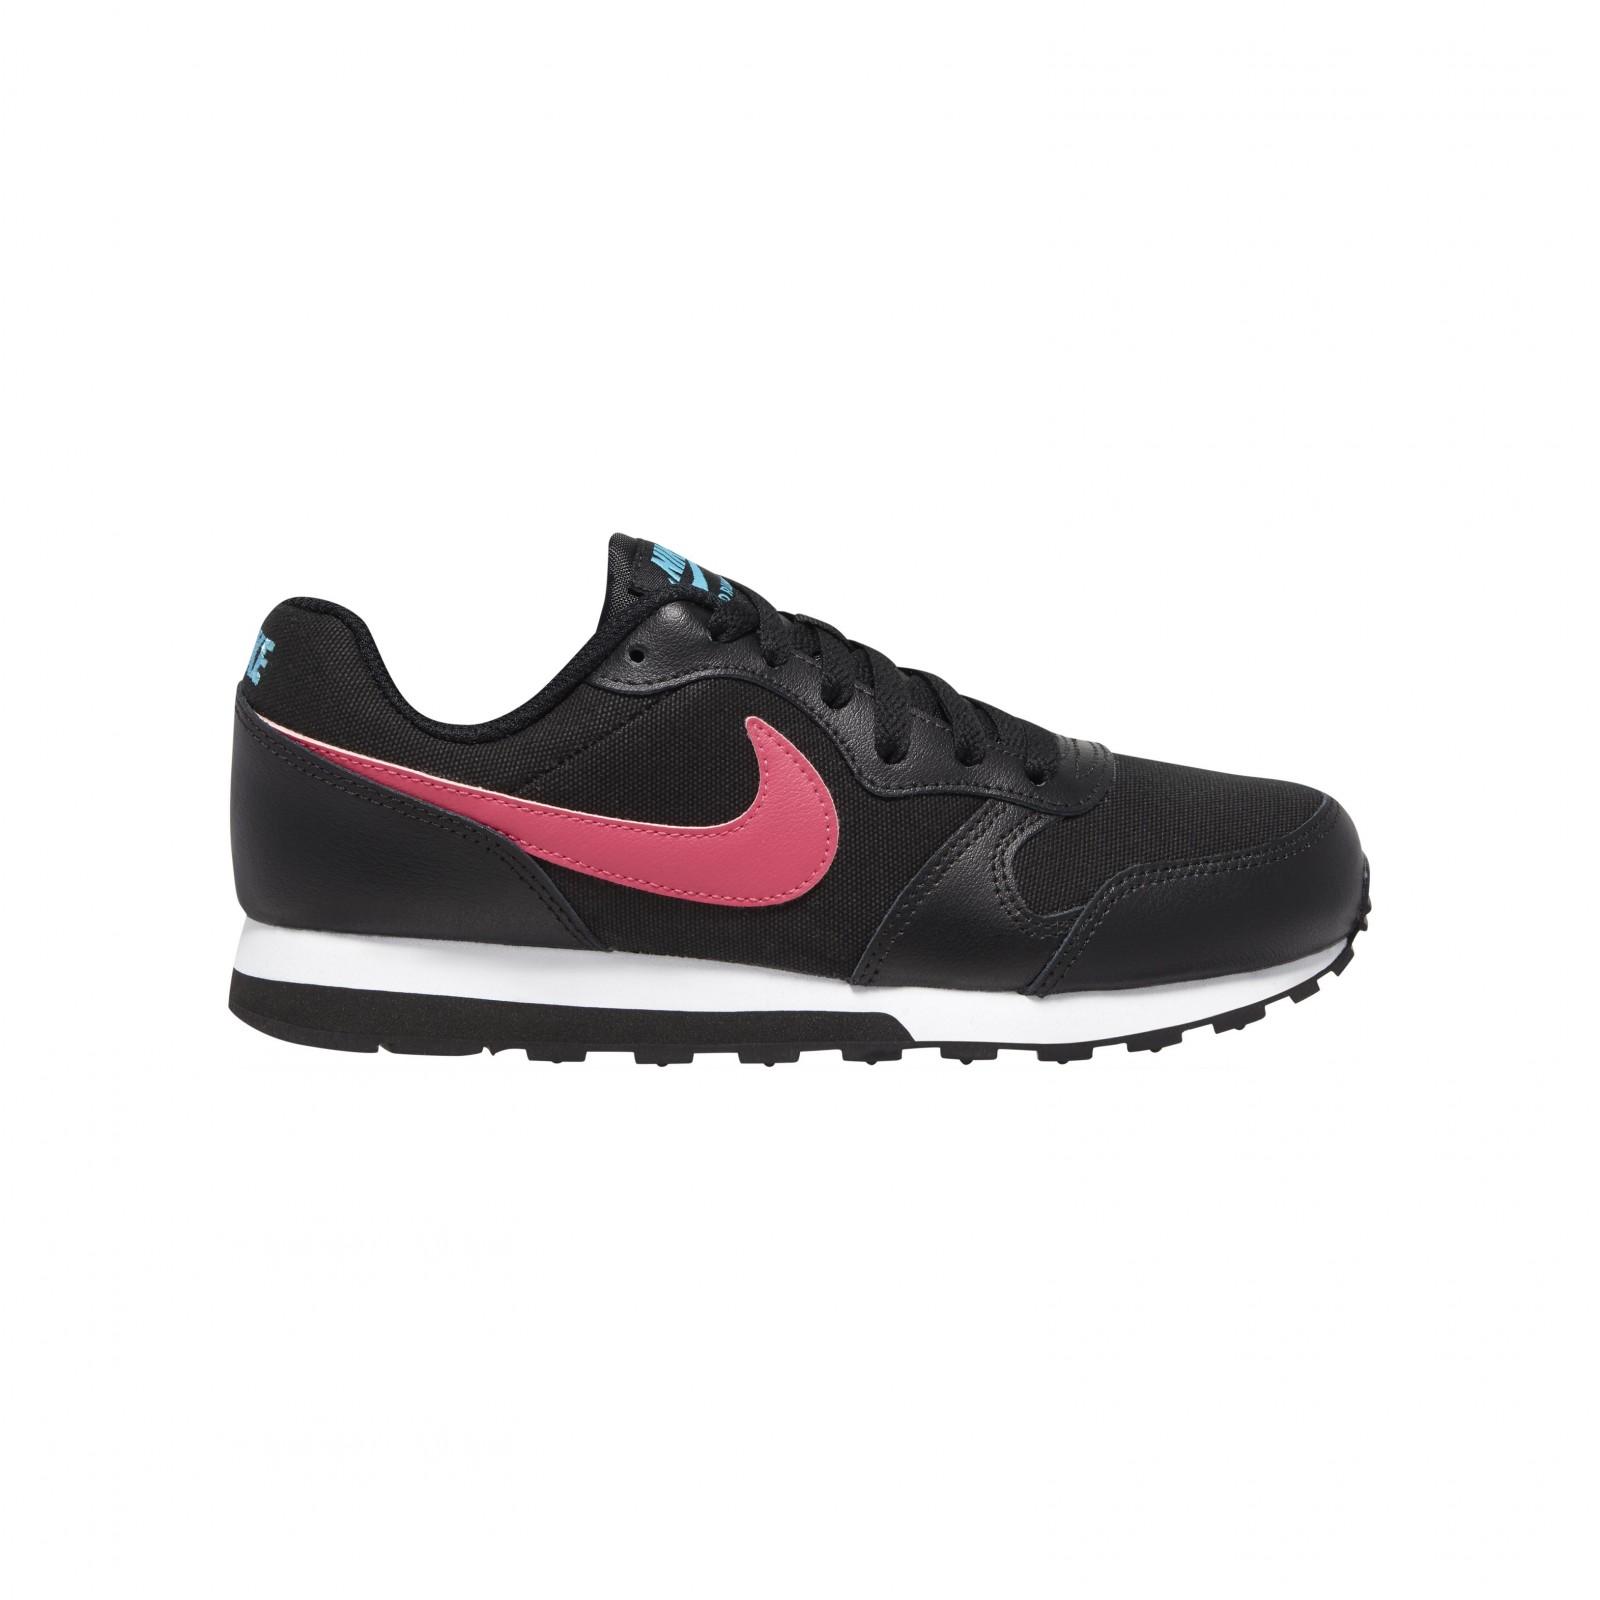 Nike md runner 2 (gs) BLACK/WATERMELON-BLUE FURY-PURPLE NEBULA